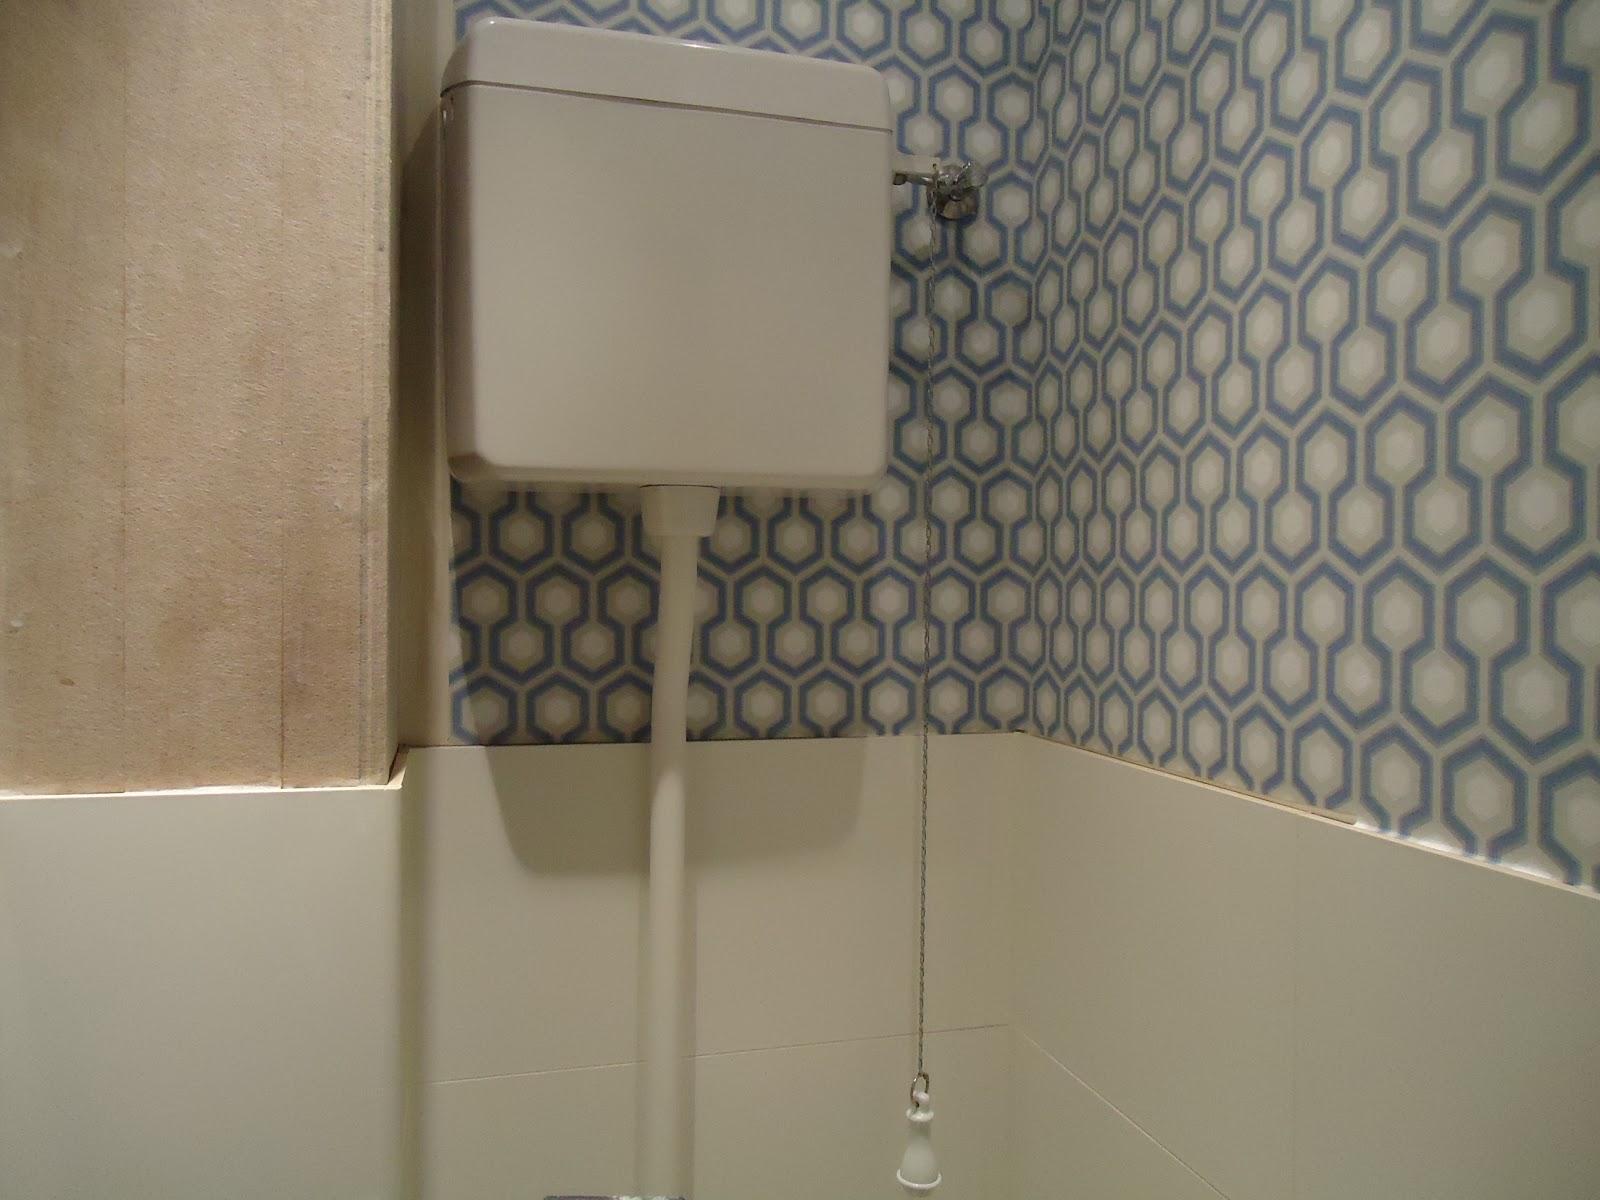 Papier Peint David Hicks 50+] david hicks hexagon wallpaper on wallpapersafari